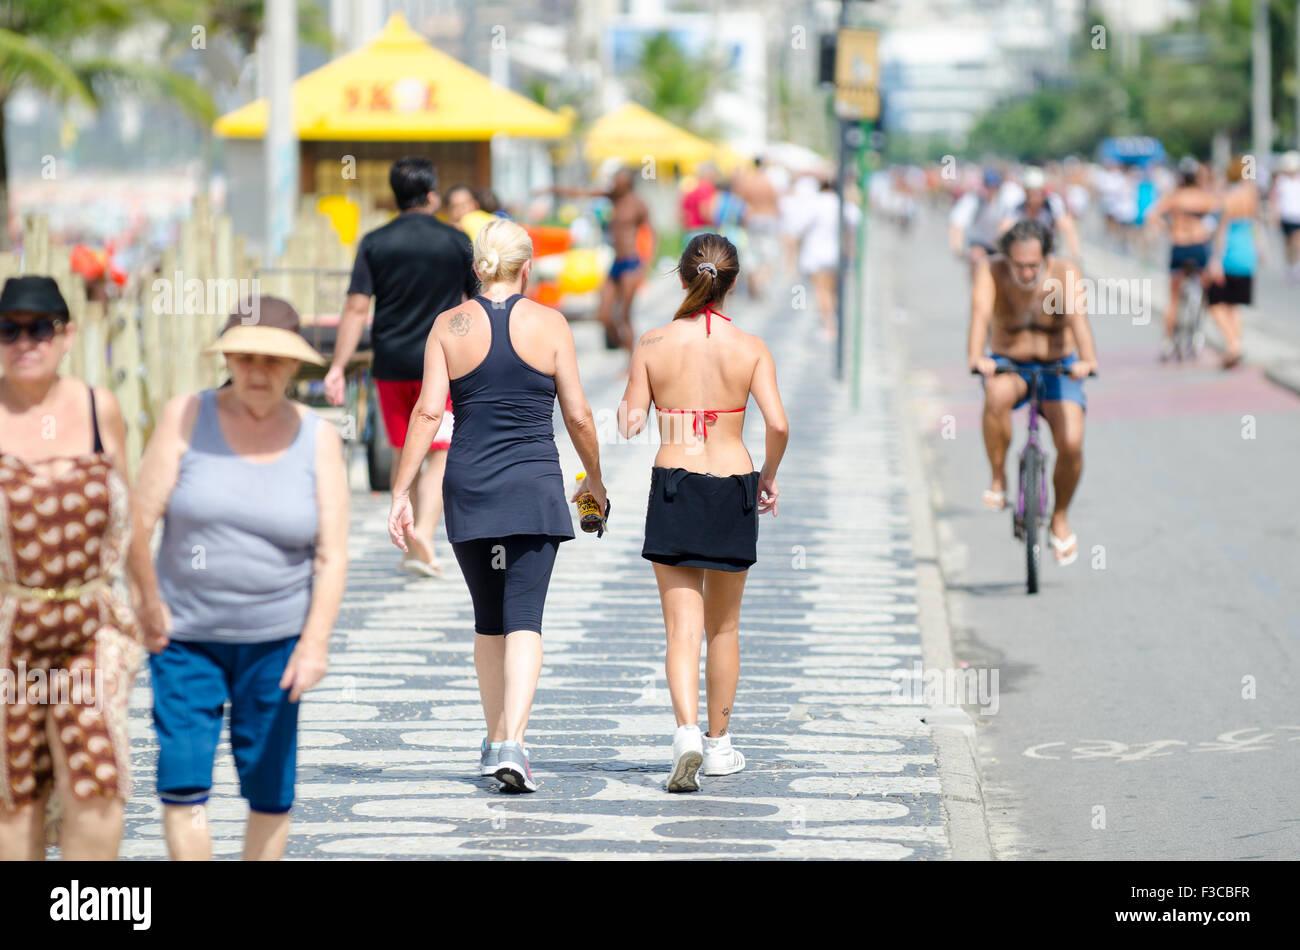 RIO DE JANEIRO, BRAZIL - FEBRUARY 20, 2013: Active residents take to the beachfront boardwalk for recreation on - Stock Image